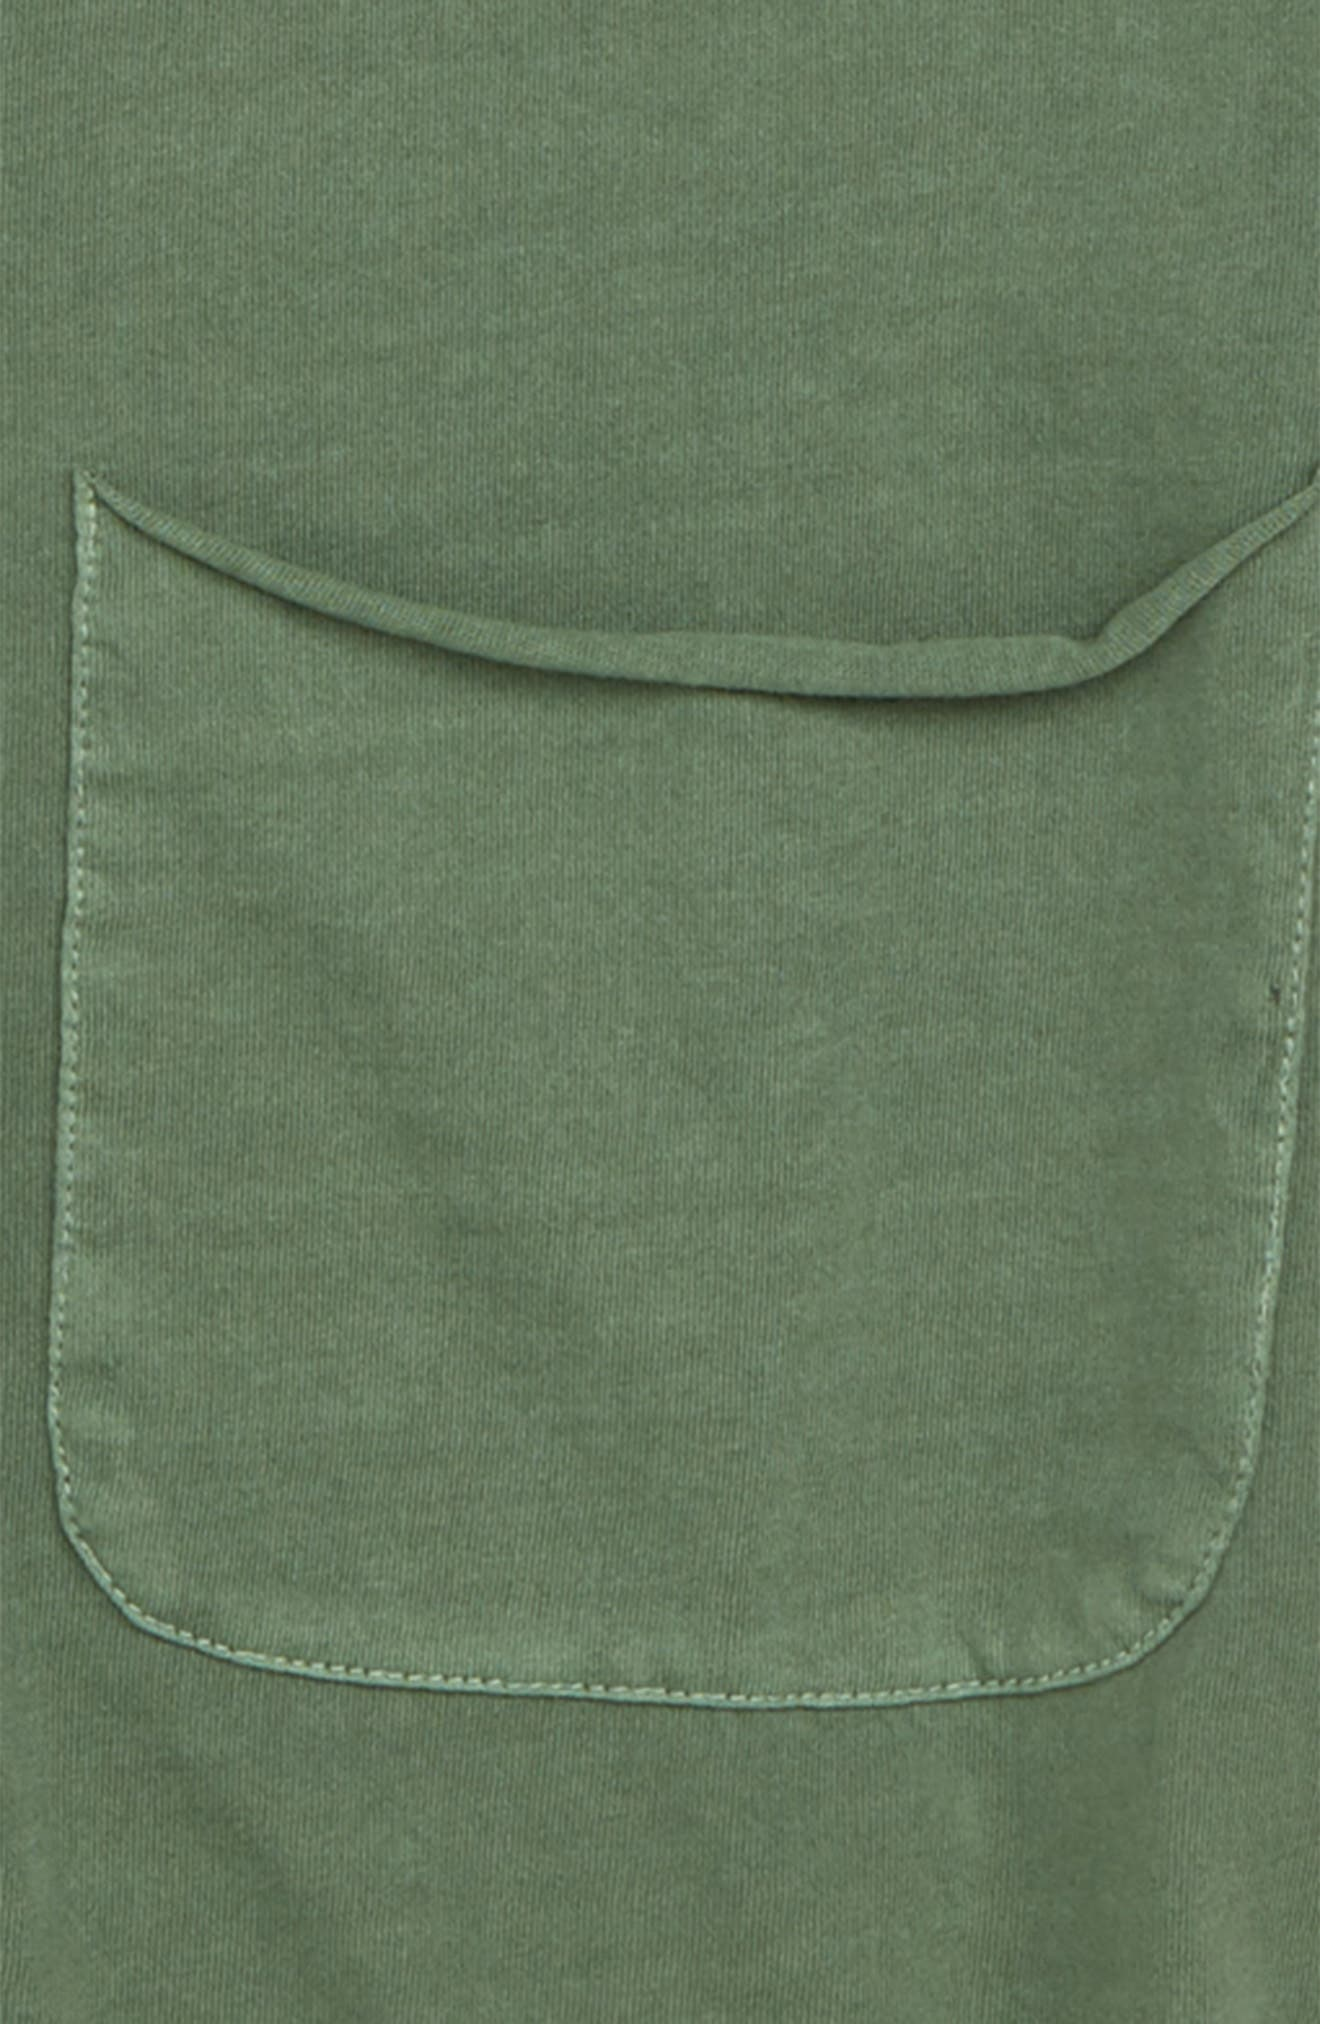 Raw Edge Pocket T-Shirt,                             Alternate thumbnail 2, color,                             Green Agave